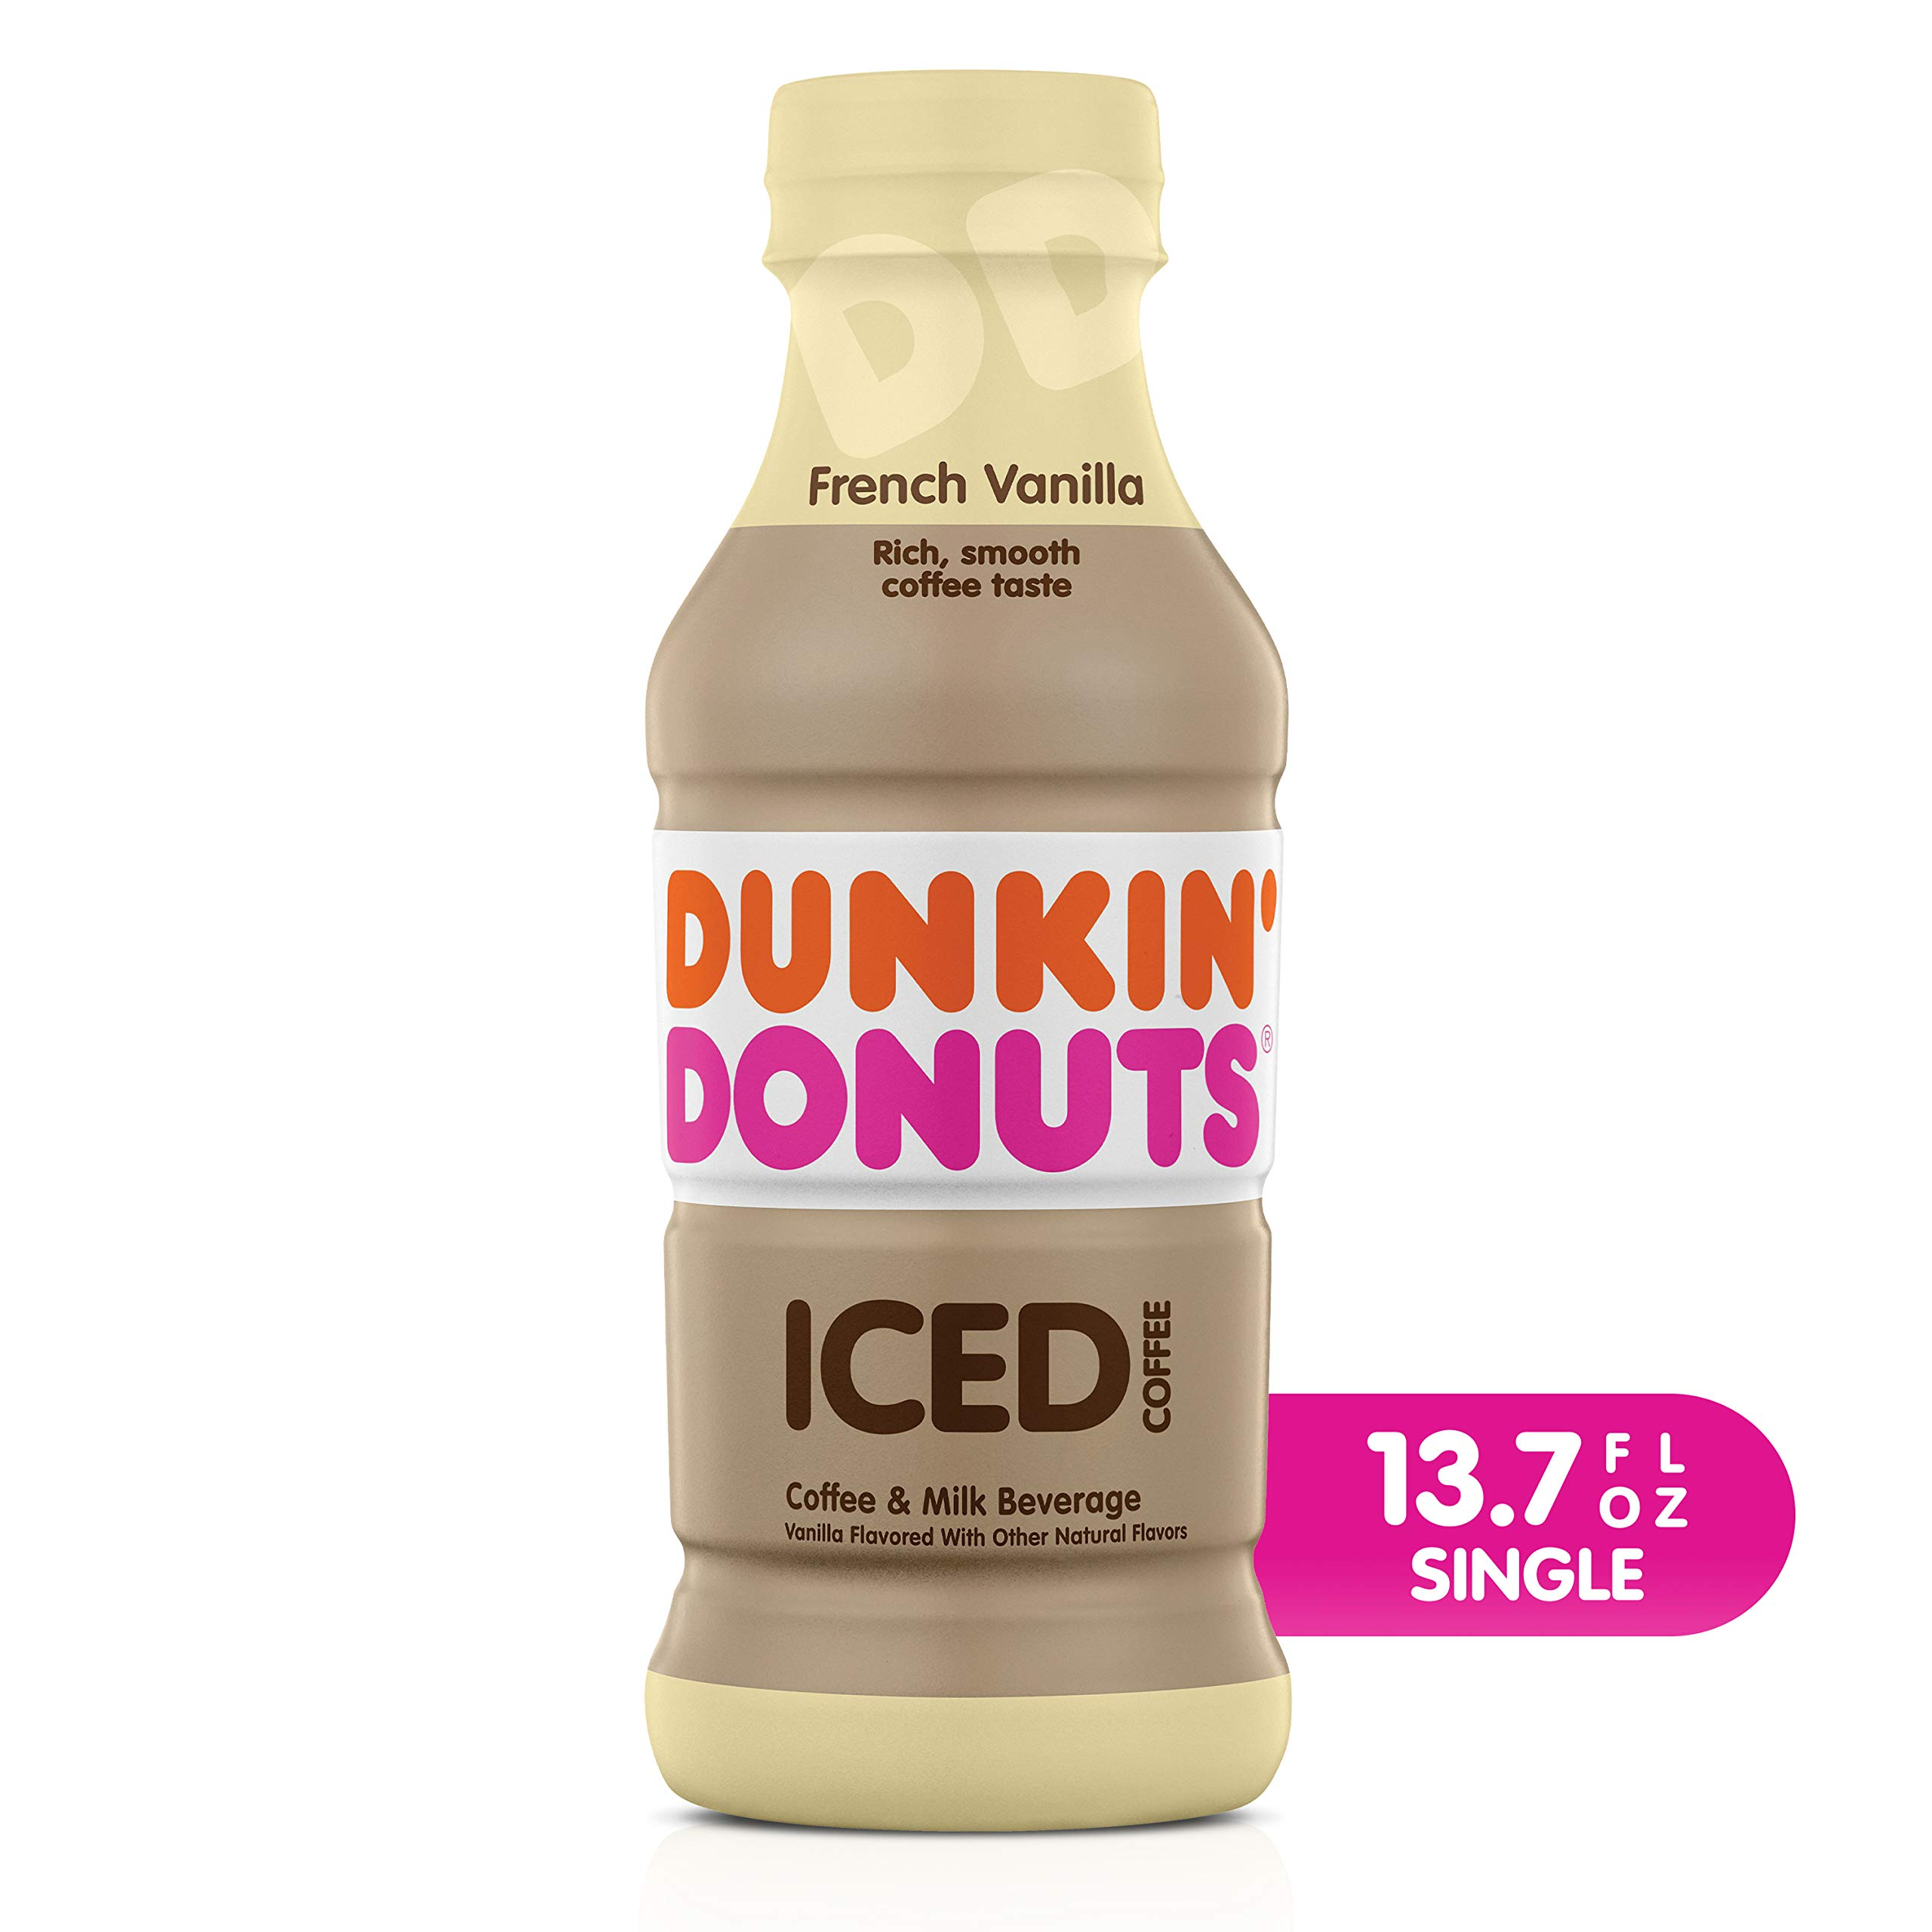 Dunkin' Donuts French Vanilla Iced Coffee Bottle, 13.7 fl oz